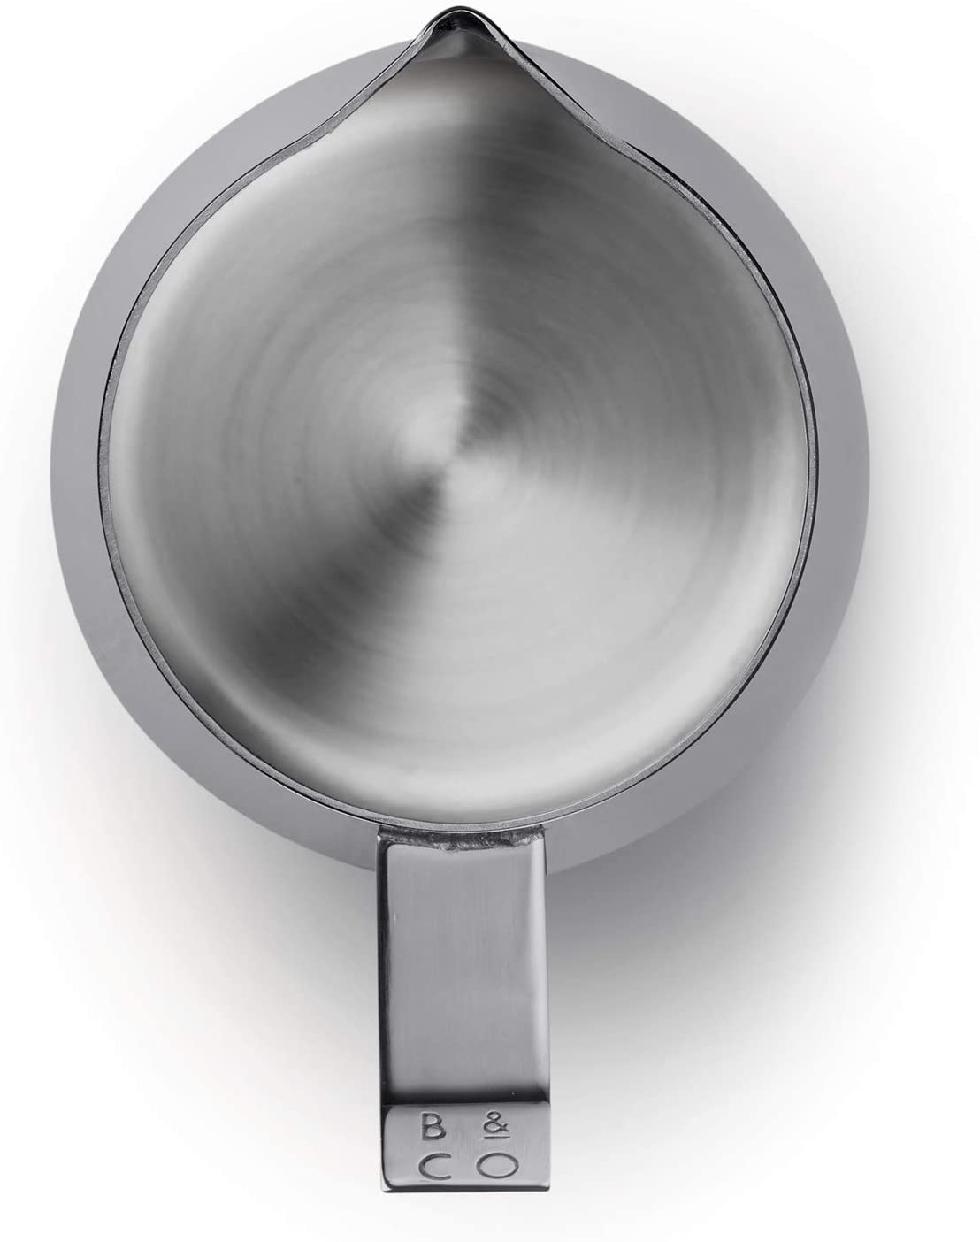 Barista&Co(バリスタアンドコー)Dial In Milk Pitcher 420ml Blackの商品画像5